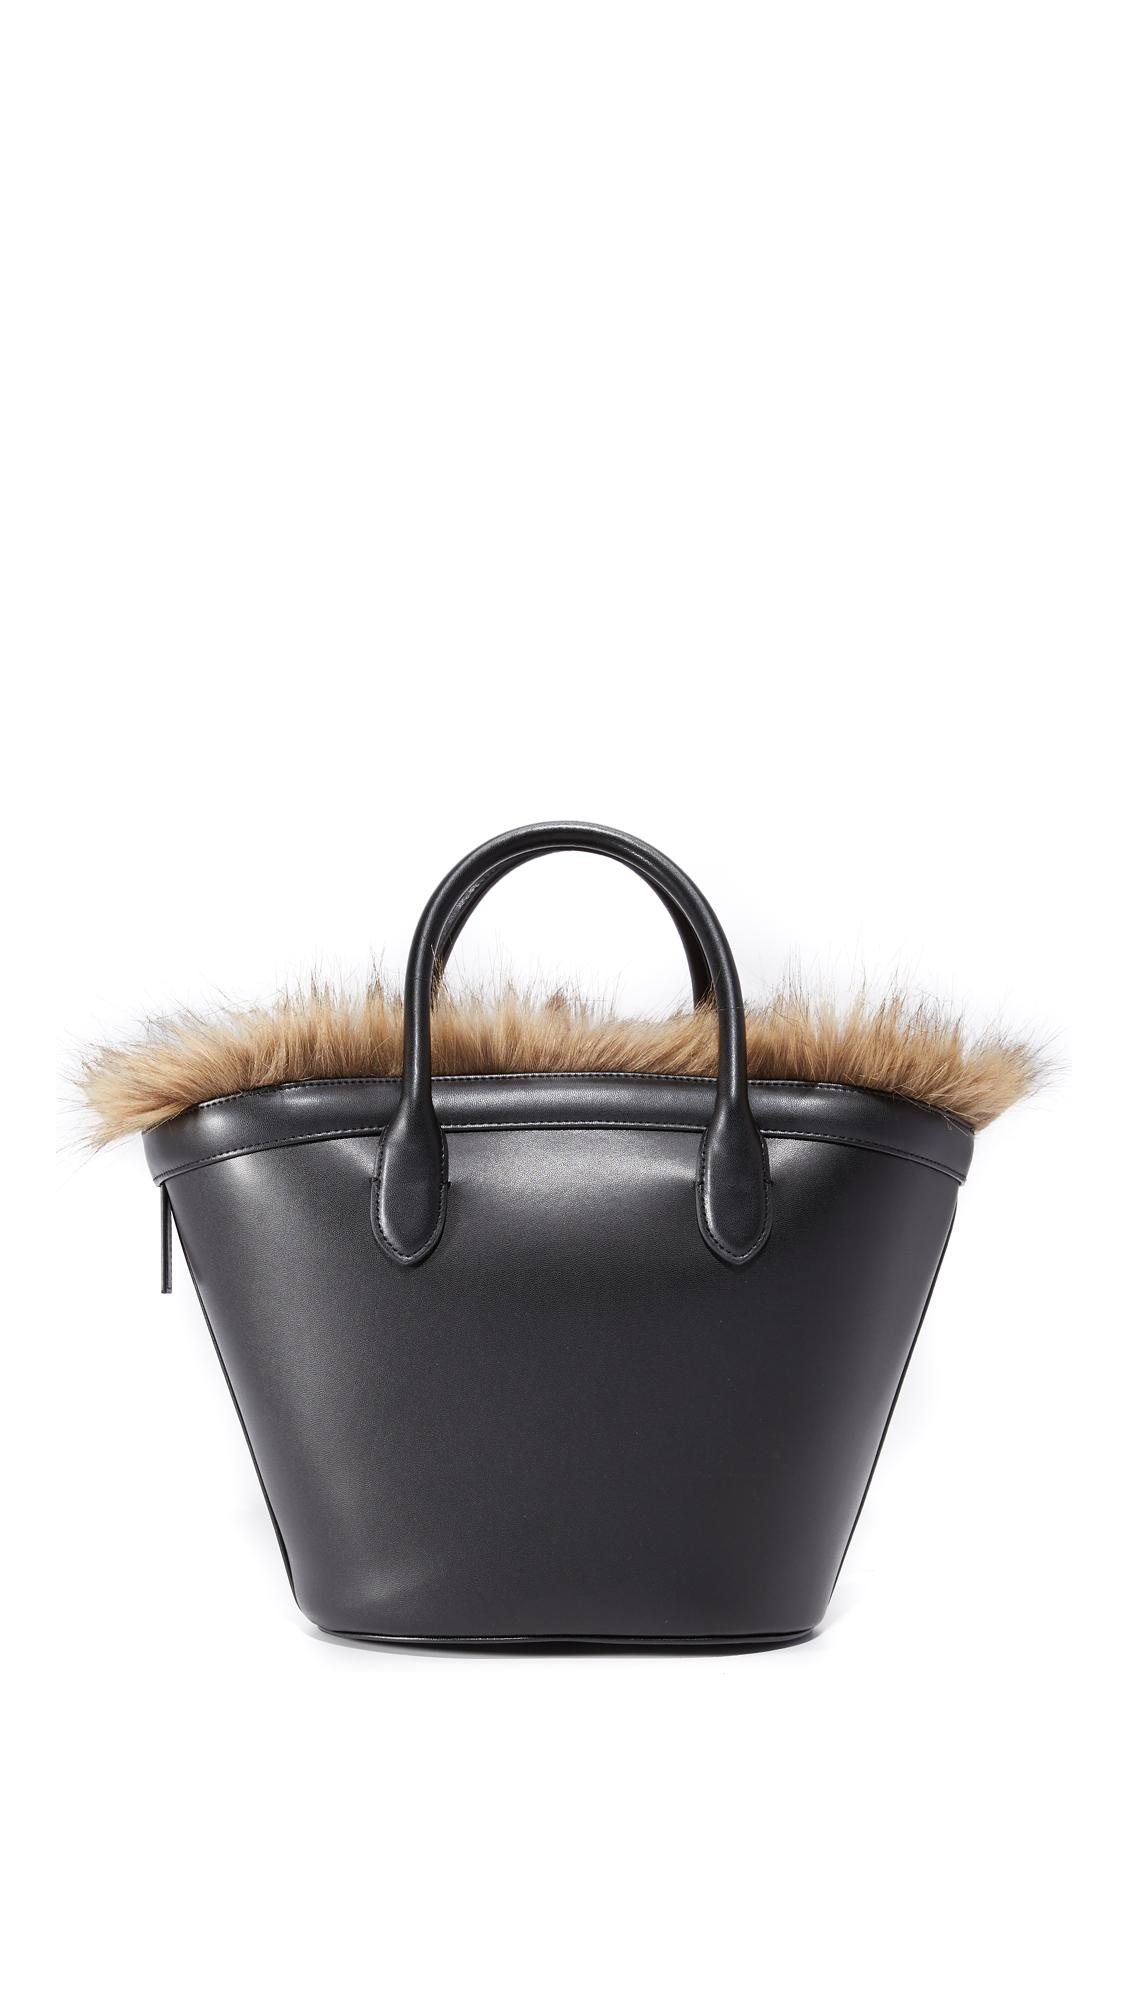 Vasic Collection Marche Mini Faux Fur Tote Shopbop Emerson Medium Brown New